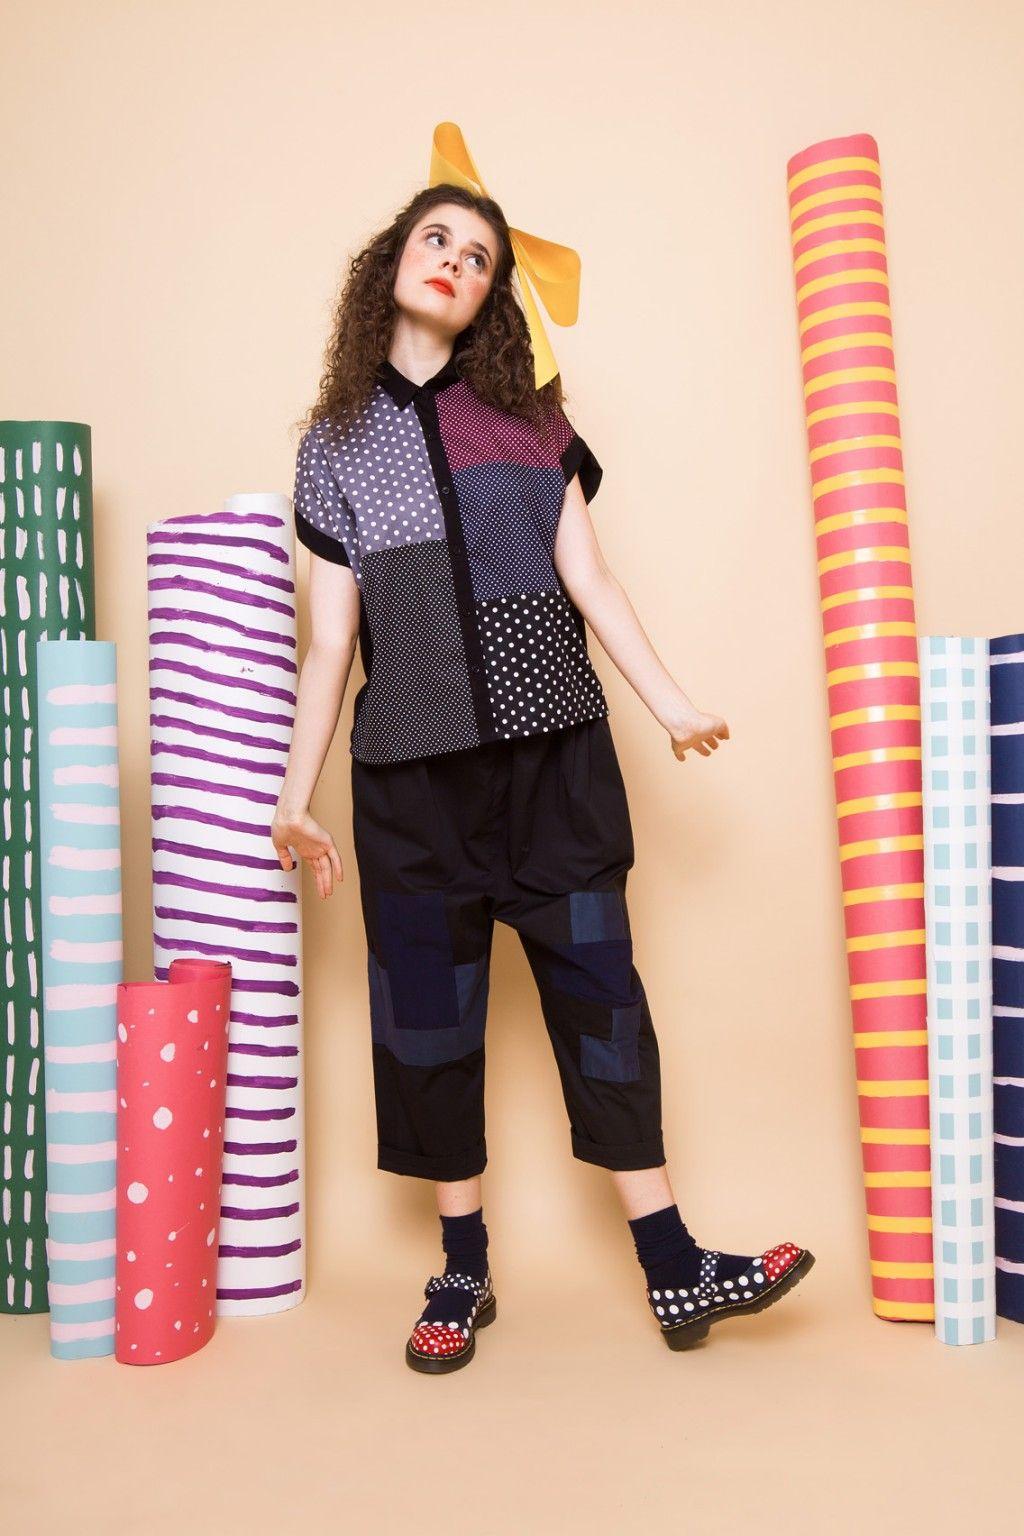 #PopbelaOOTD: Tambah Koleksi Pakainmu dengan Baju Polka Dot yang Chic!